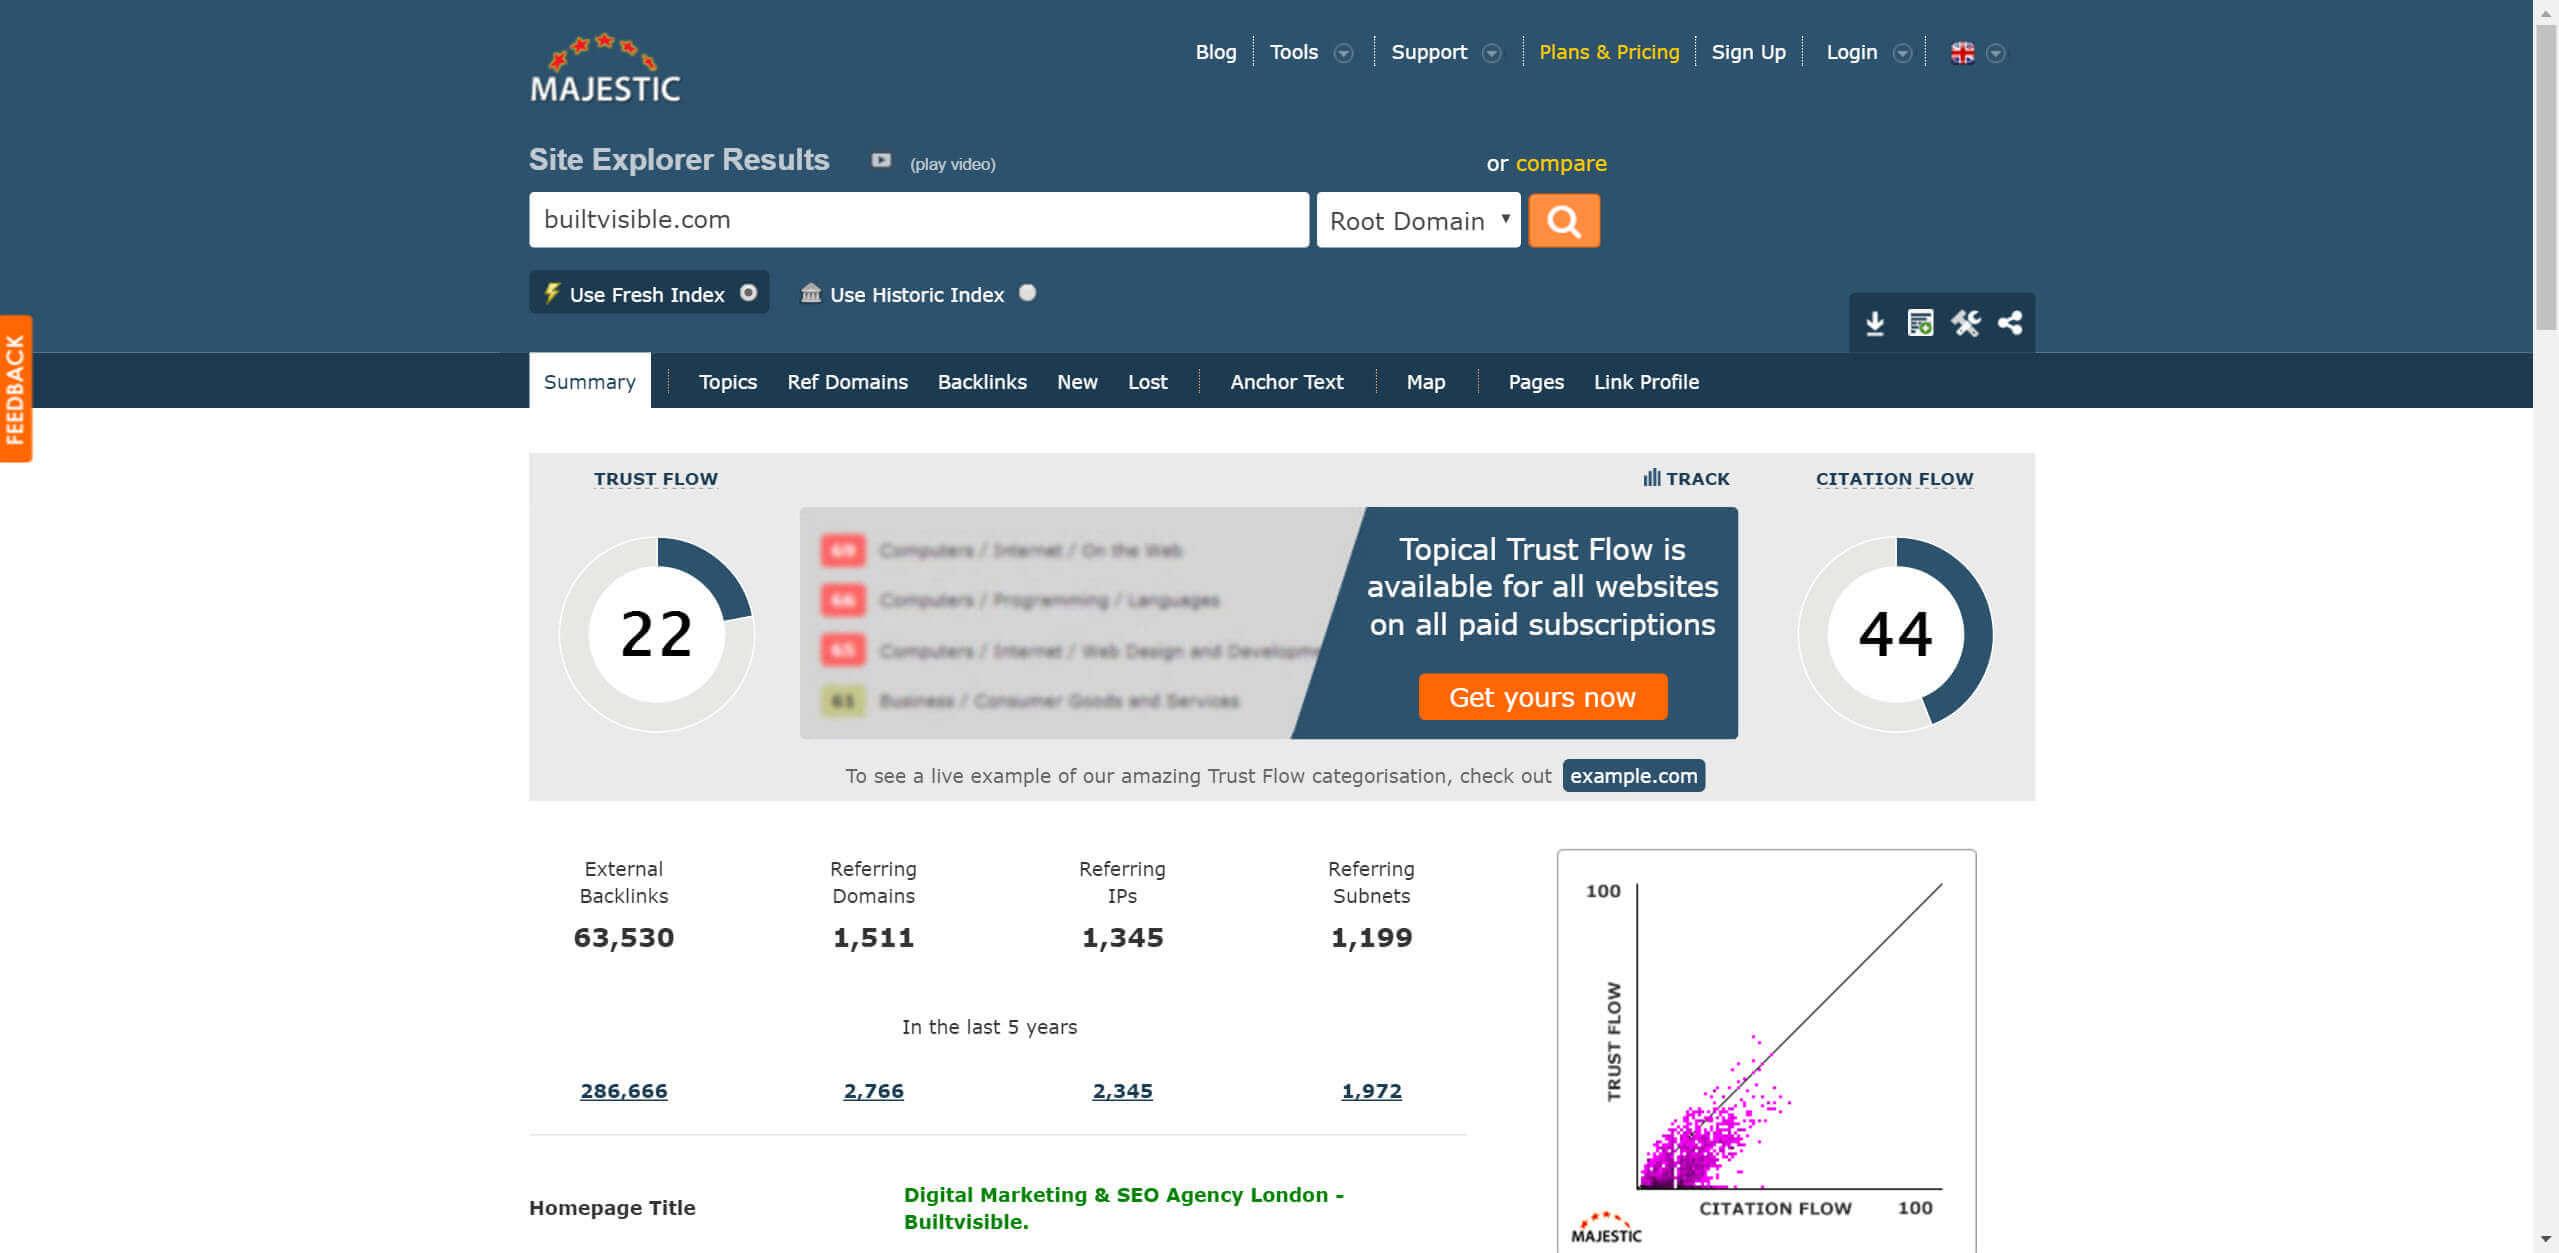 Best SEO Tools, Free SEO Tools, Free Online SEO Tools, SEO Backlink Analysis Tool, SEO Keyword Tool, Marketing SEO Tools, SEO Checker Tool, Best SEO Software, Google SEO Tools, SEO Monitoring Tool, SEO Audit Tool, SEO Reporting Tool, SEO Tracker Tool, SEO Ranking Tool, SEO Tools online, SEO keyword research tool, Keyword research tools, Seo backlink checker, SEO competitor analysis tools